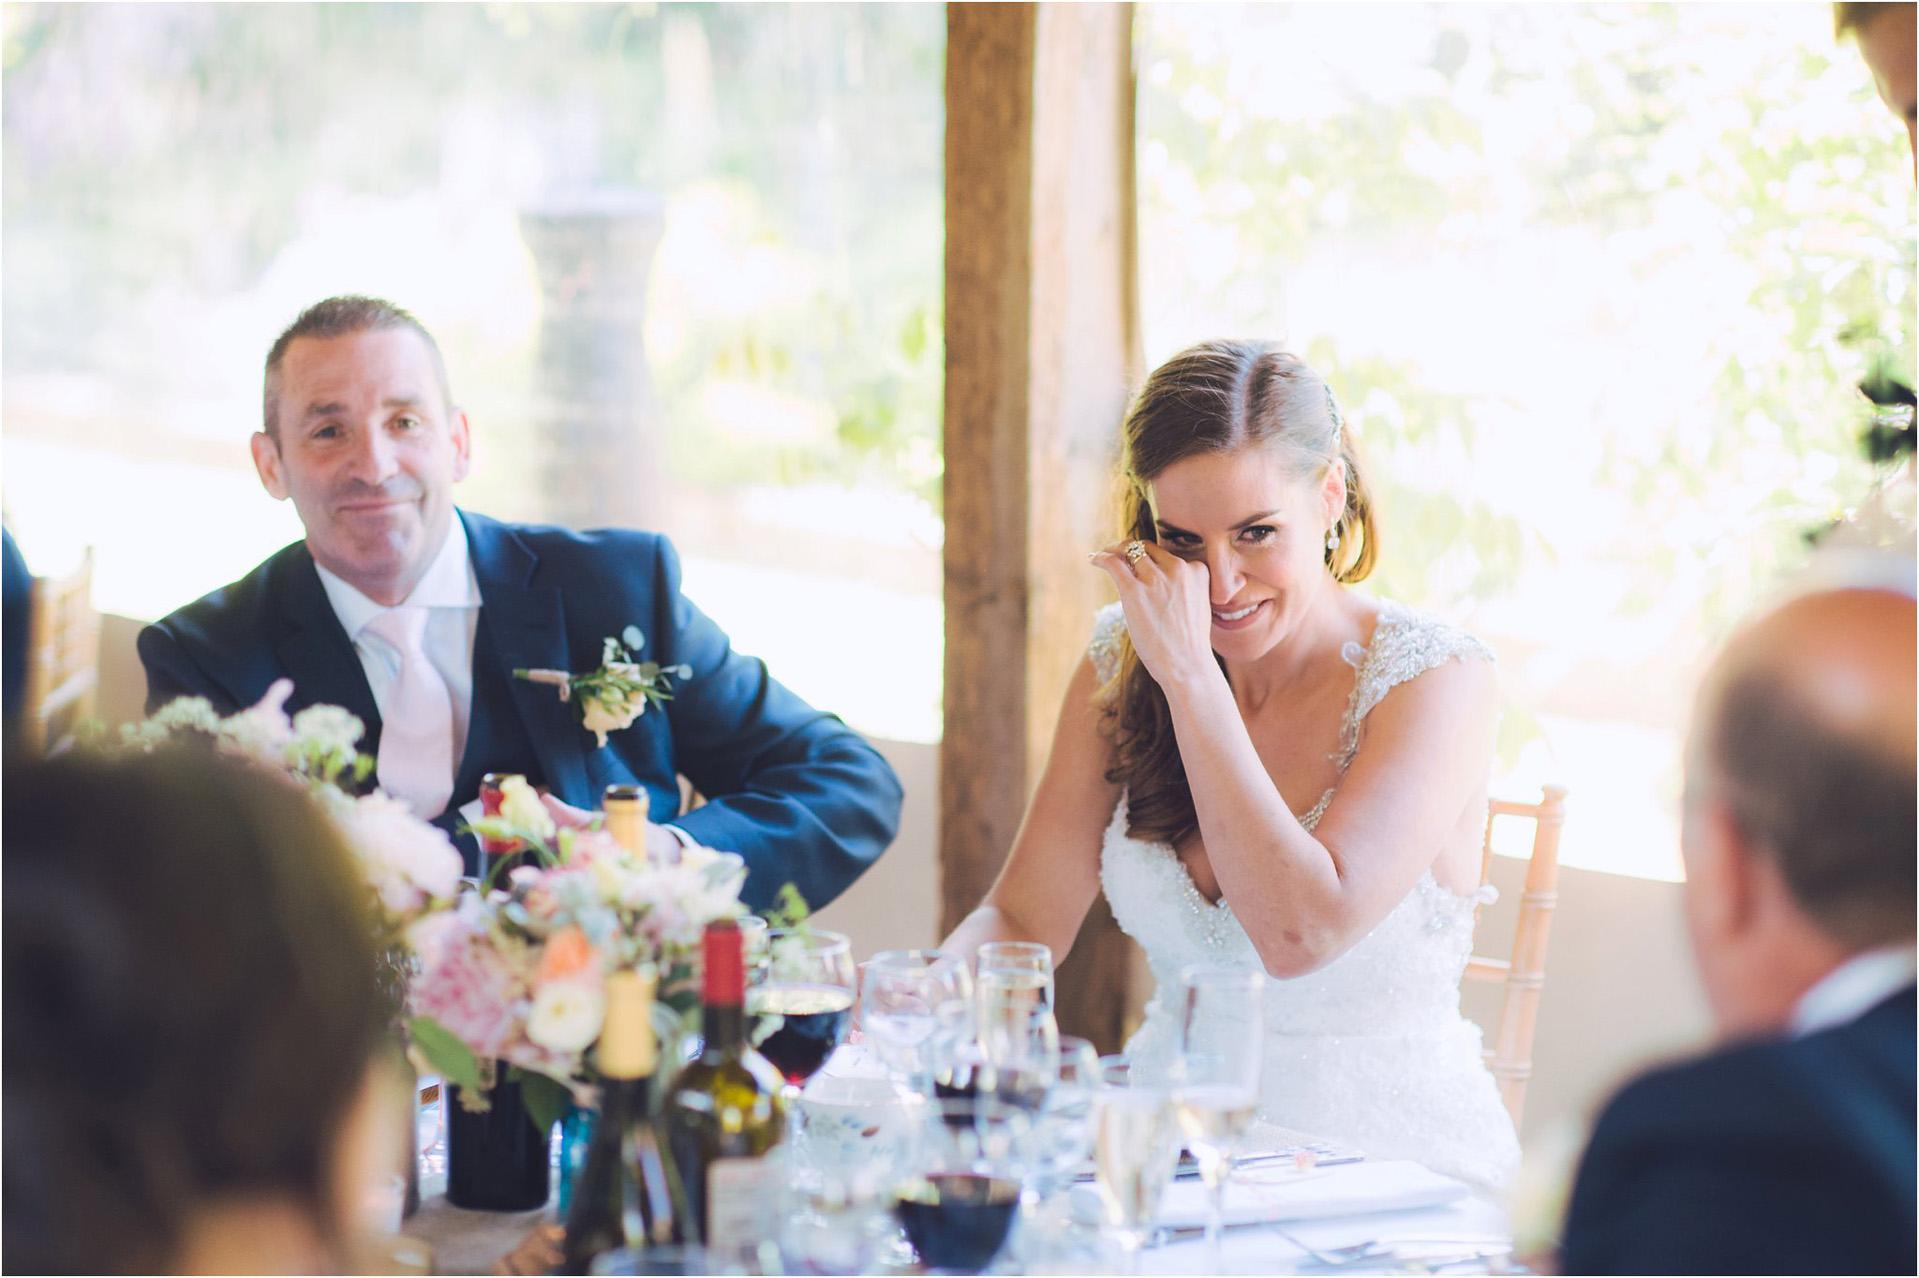 Simon biffen wedding photography 0112